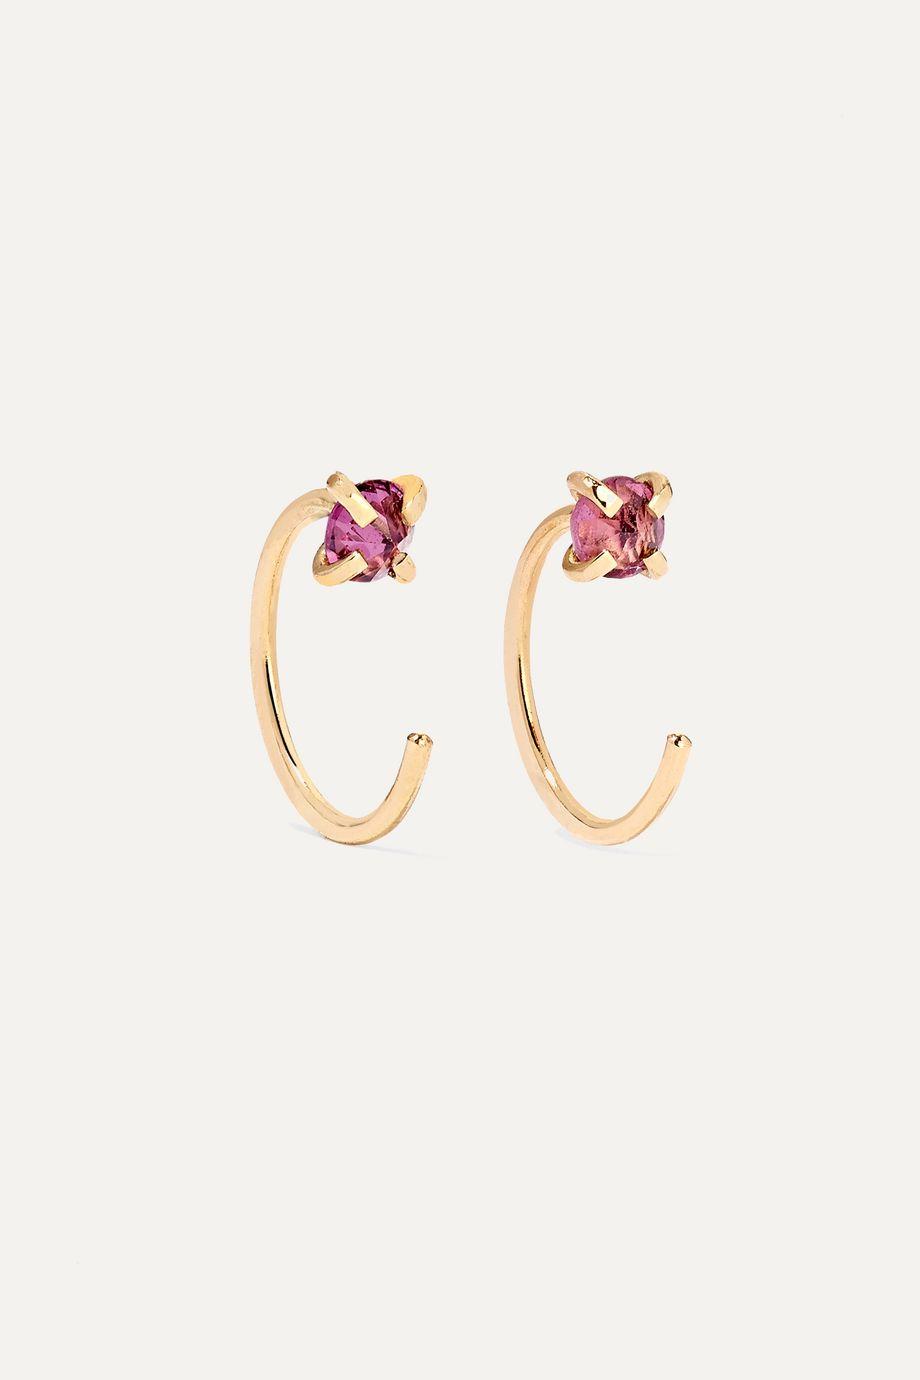 Melissa Joy Manning 14-karat gold rhodolite garnet earrings